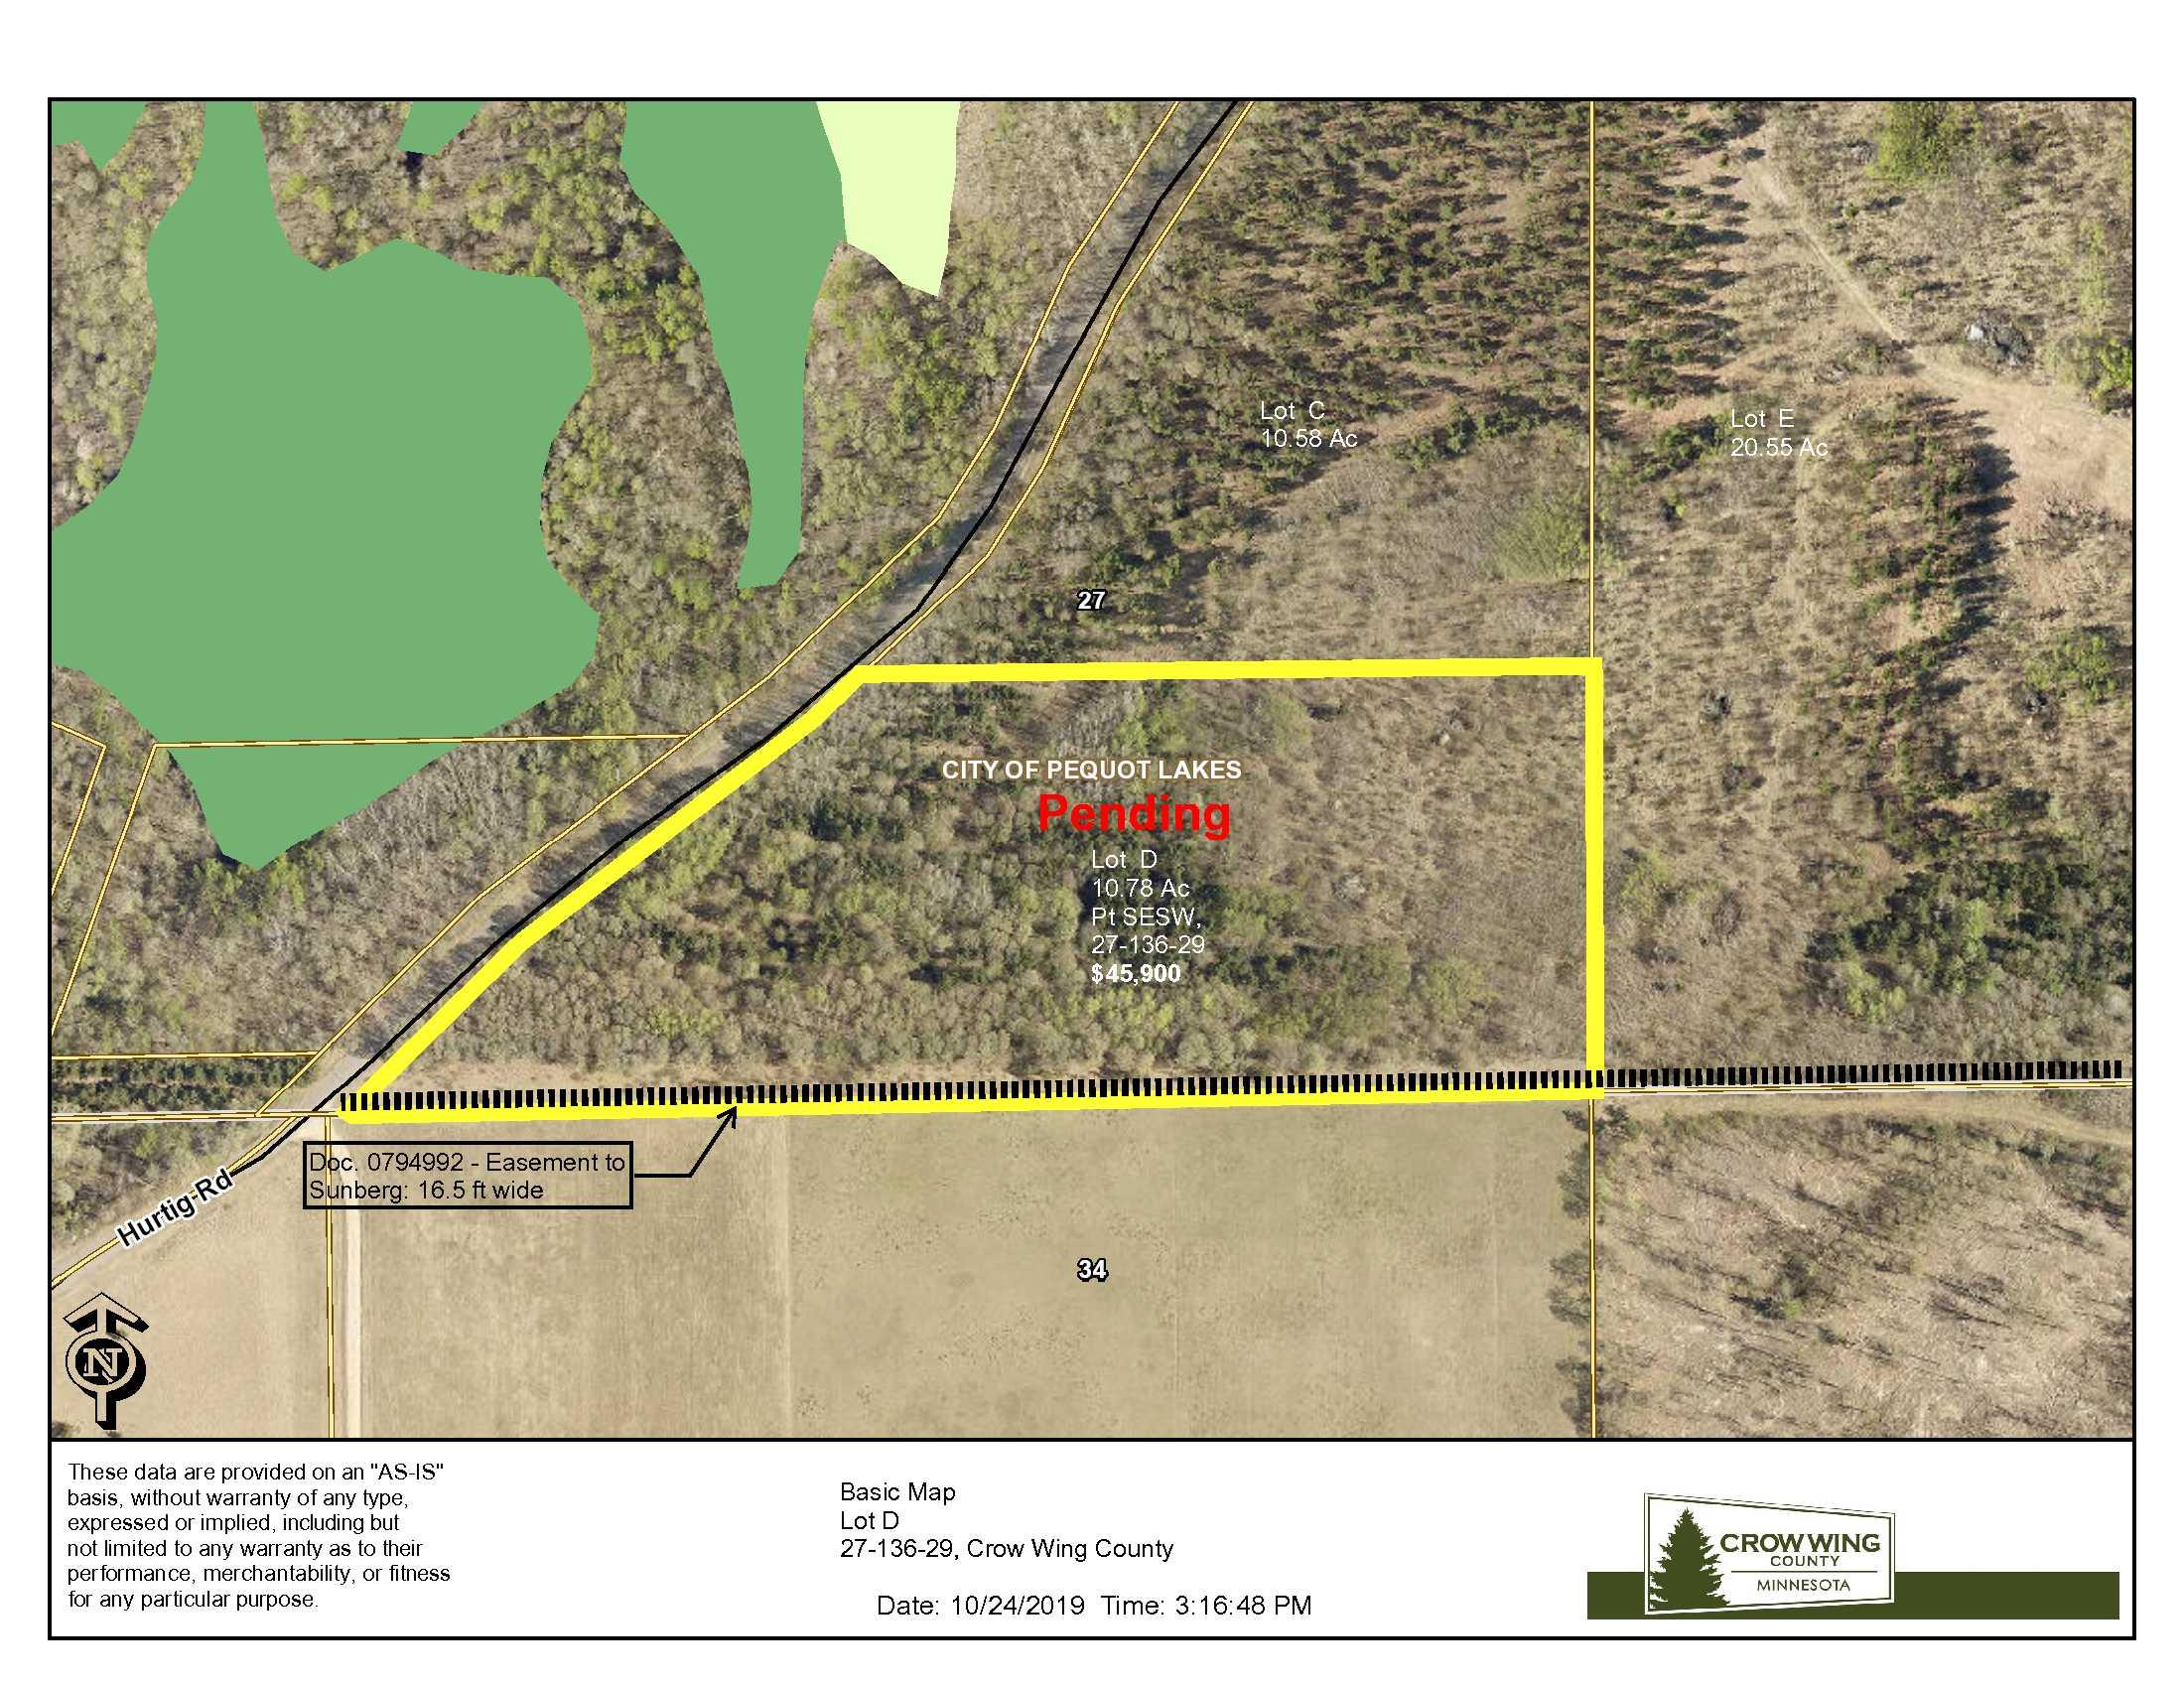 Lot D, 27-136-29, Hurtig Road, Pequot Lakes, Crow Wing Co